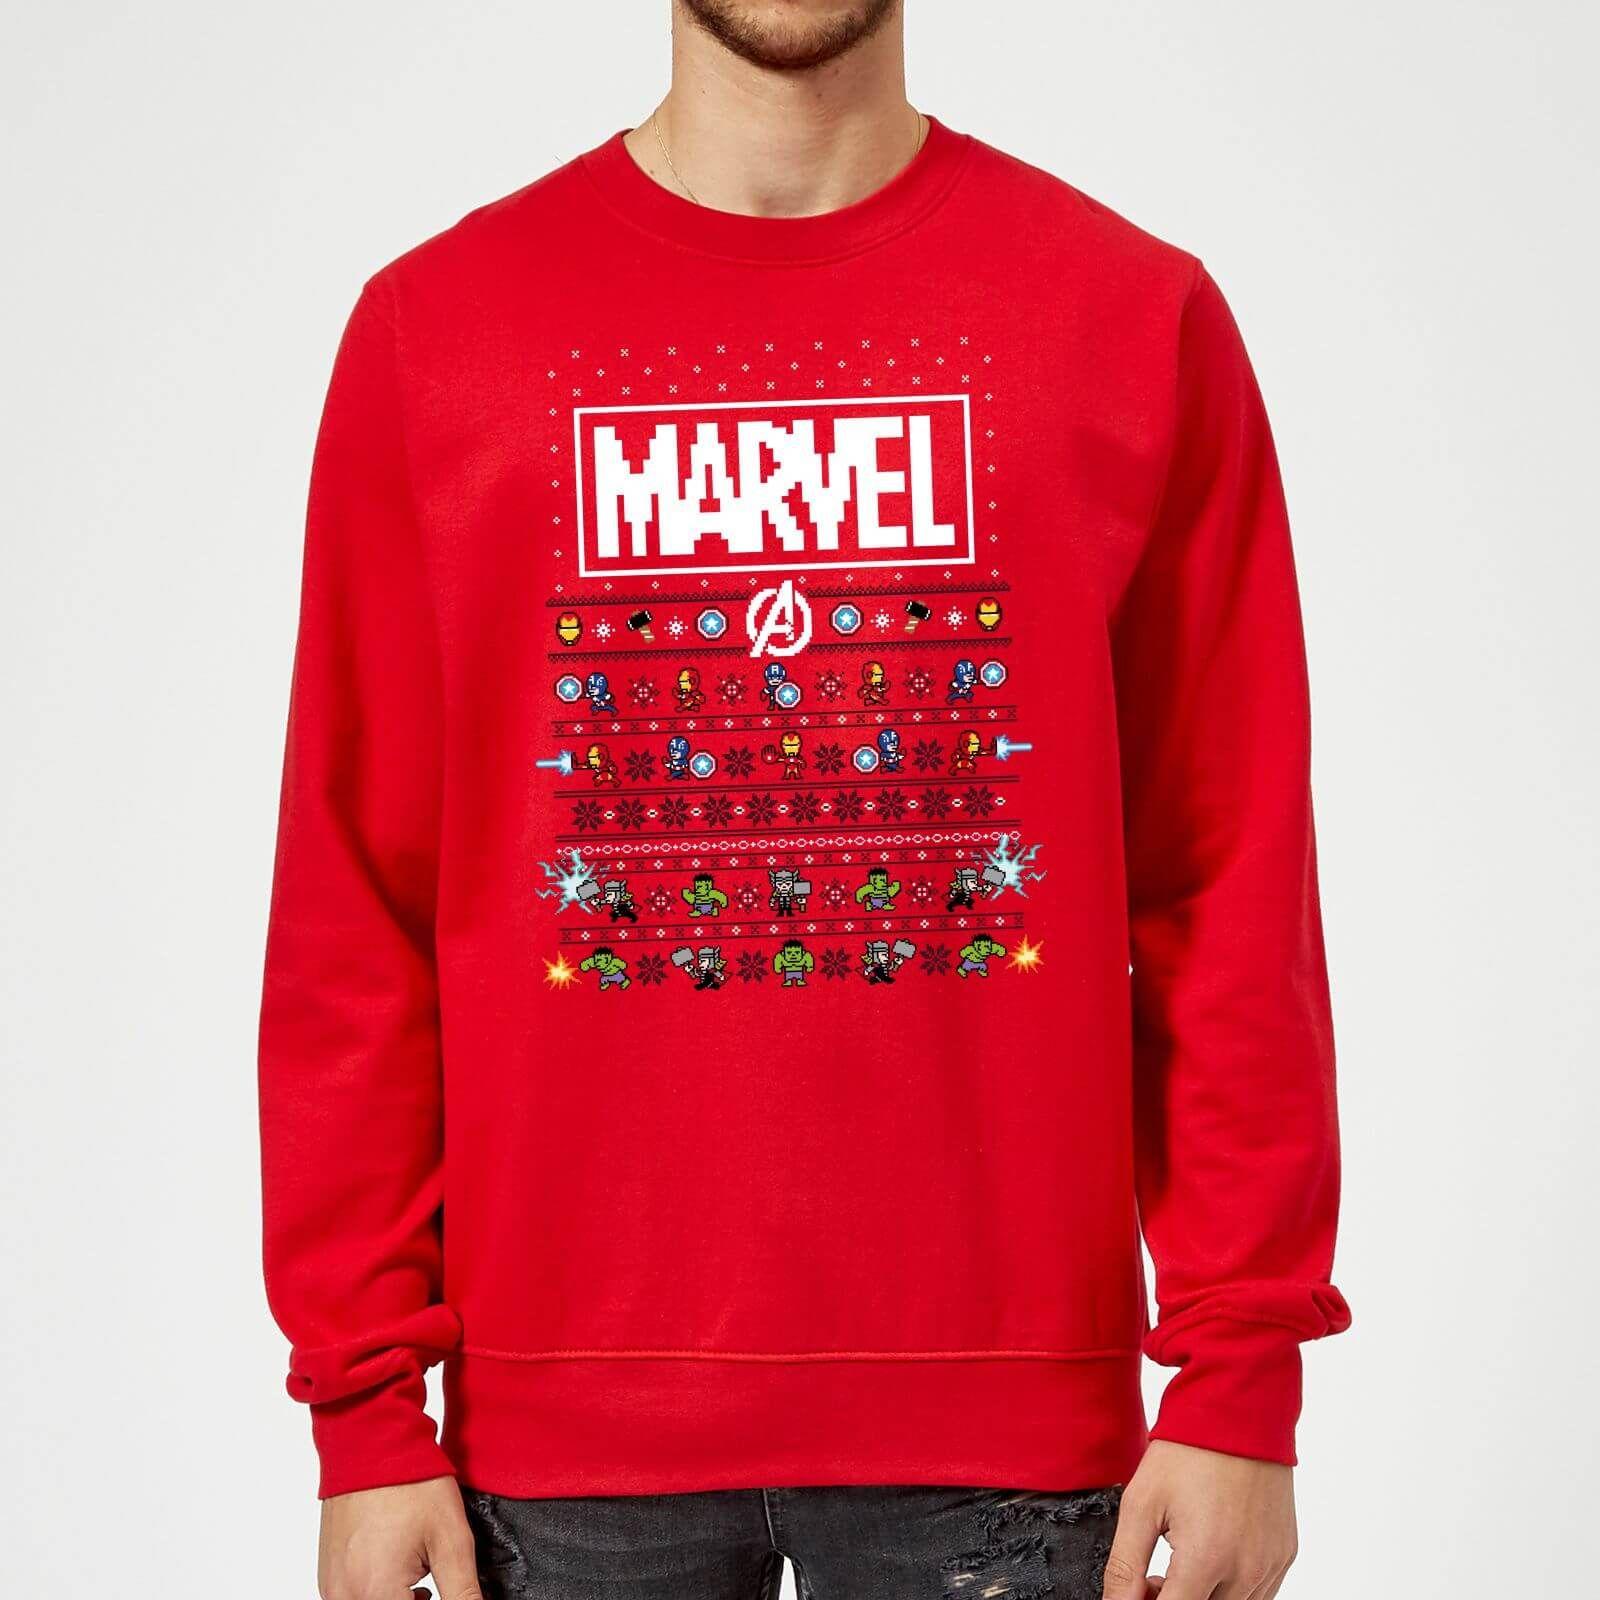 Sweats et pulls Marvel de Noël en promotion - Ex : Pull de Noël Homme Marvel Avengers Pixel Art - Rouge